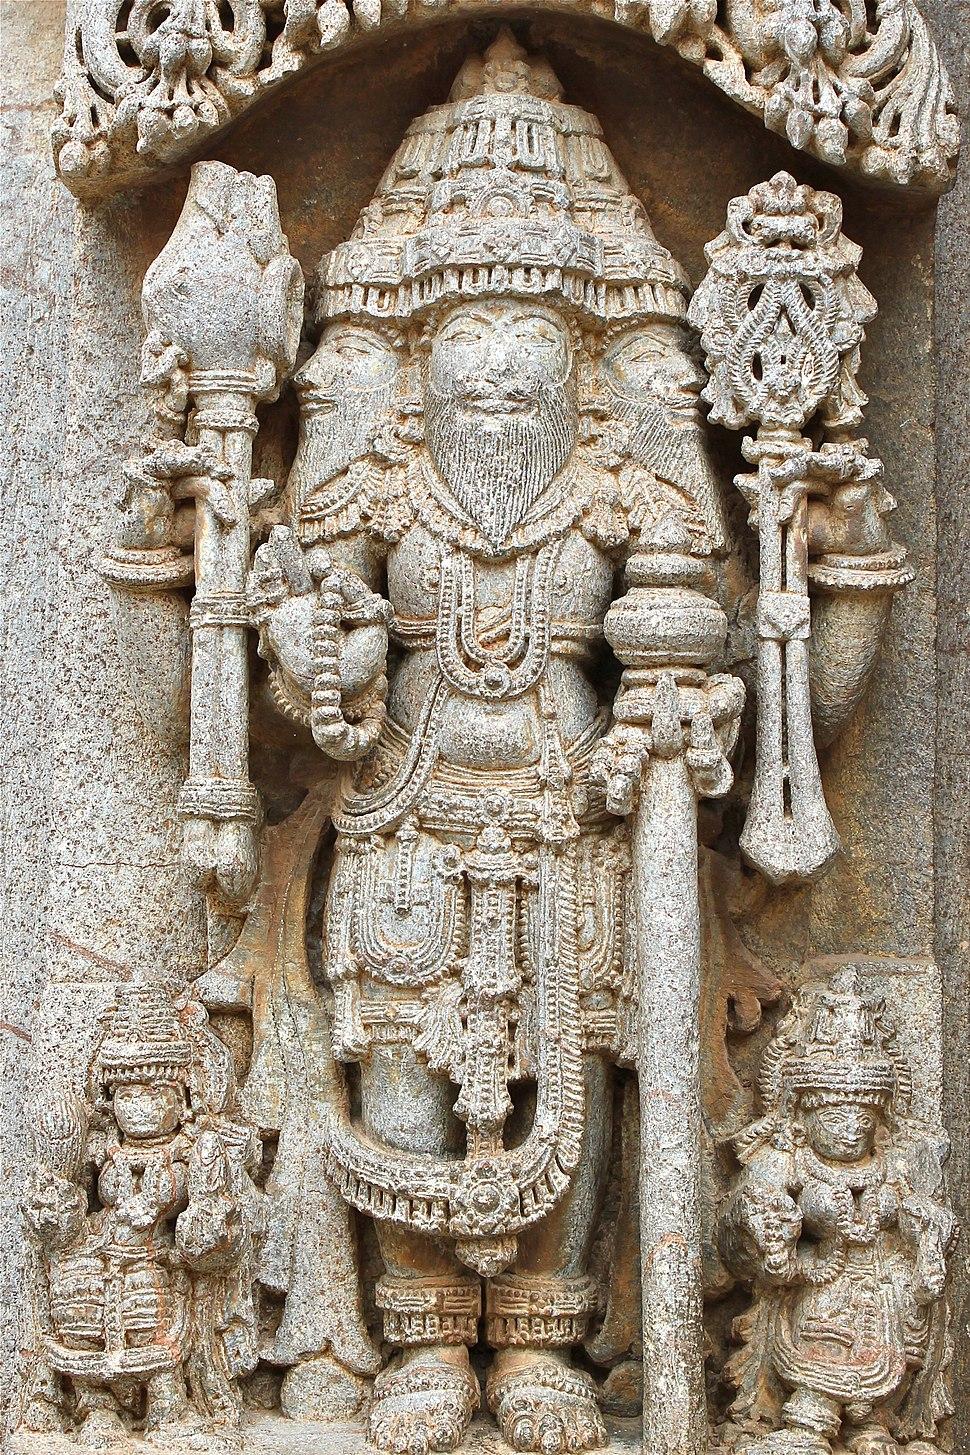 12th century Chennakesava temple at Somanathapura, Karnataka, India Lord Brahma